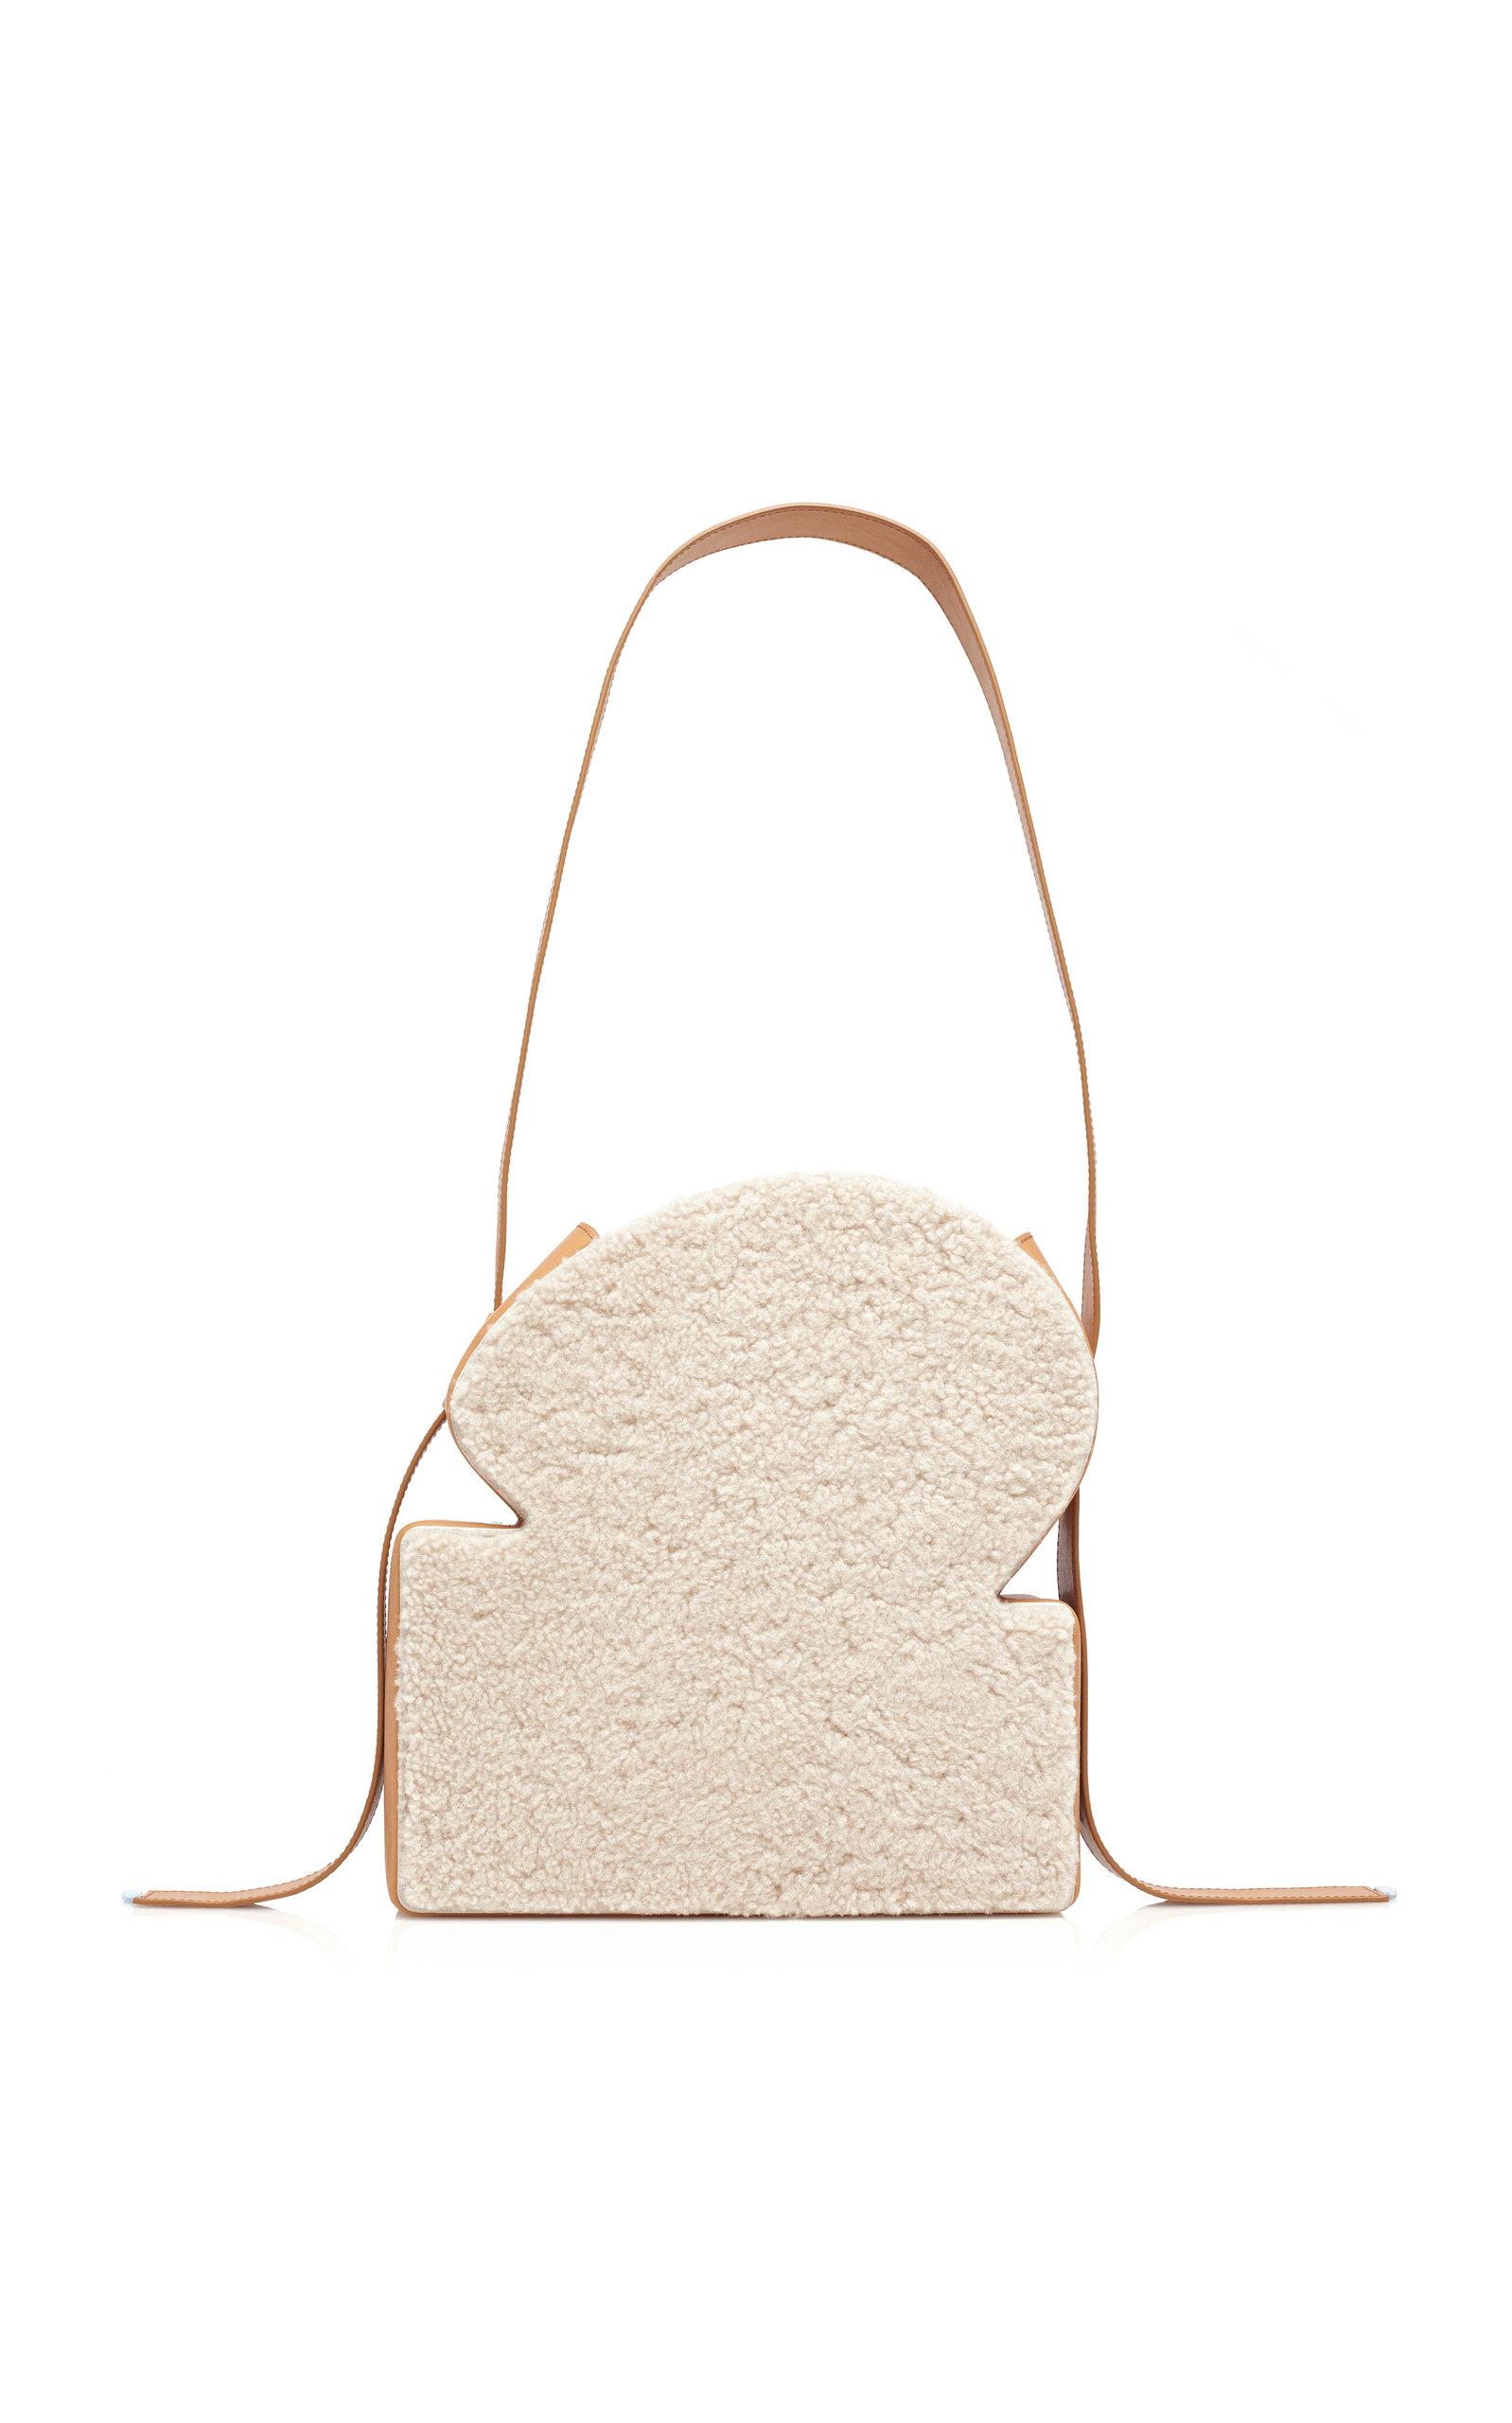 Rejina Pyo Bags TOASTIE SHEEPSKIN BAG